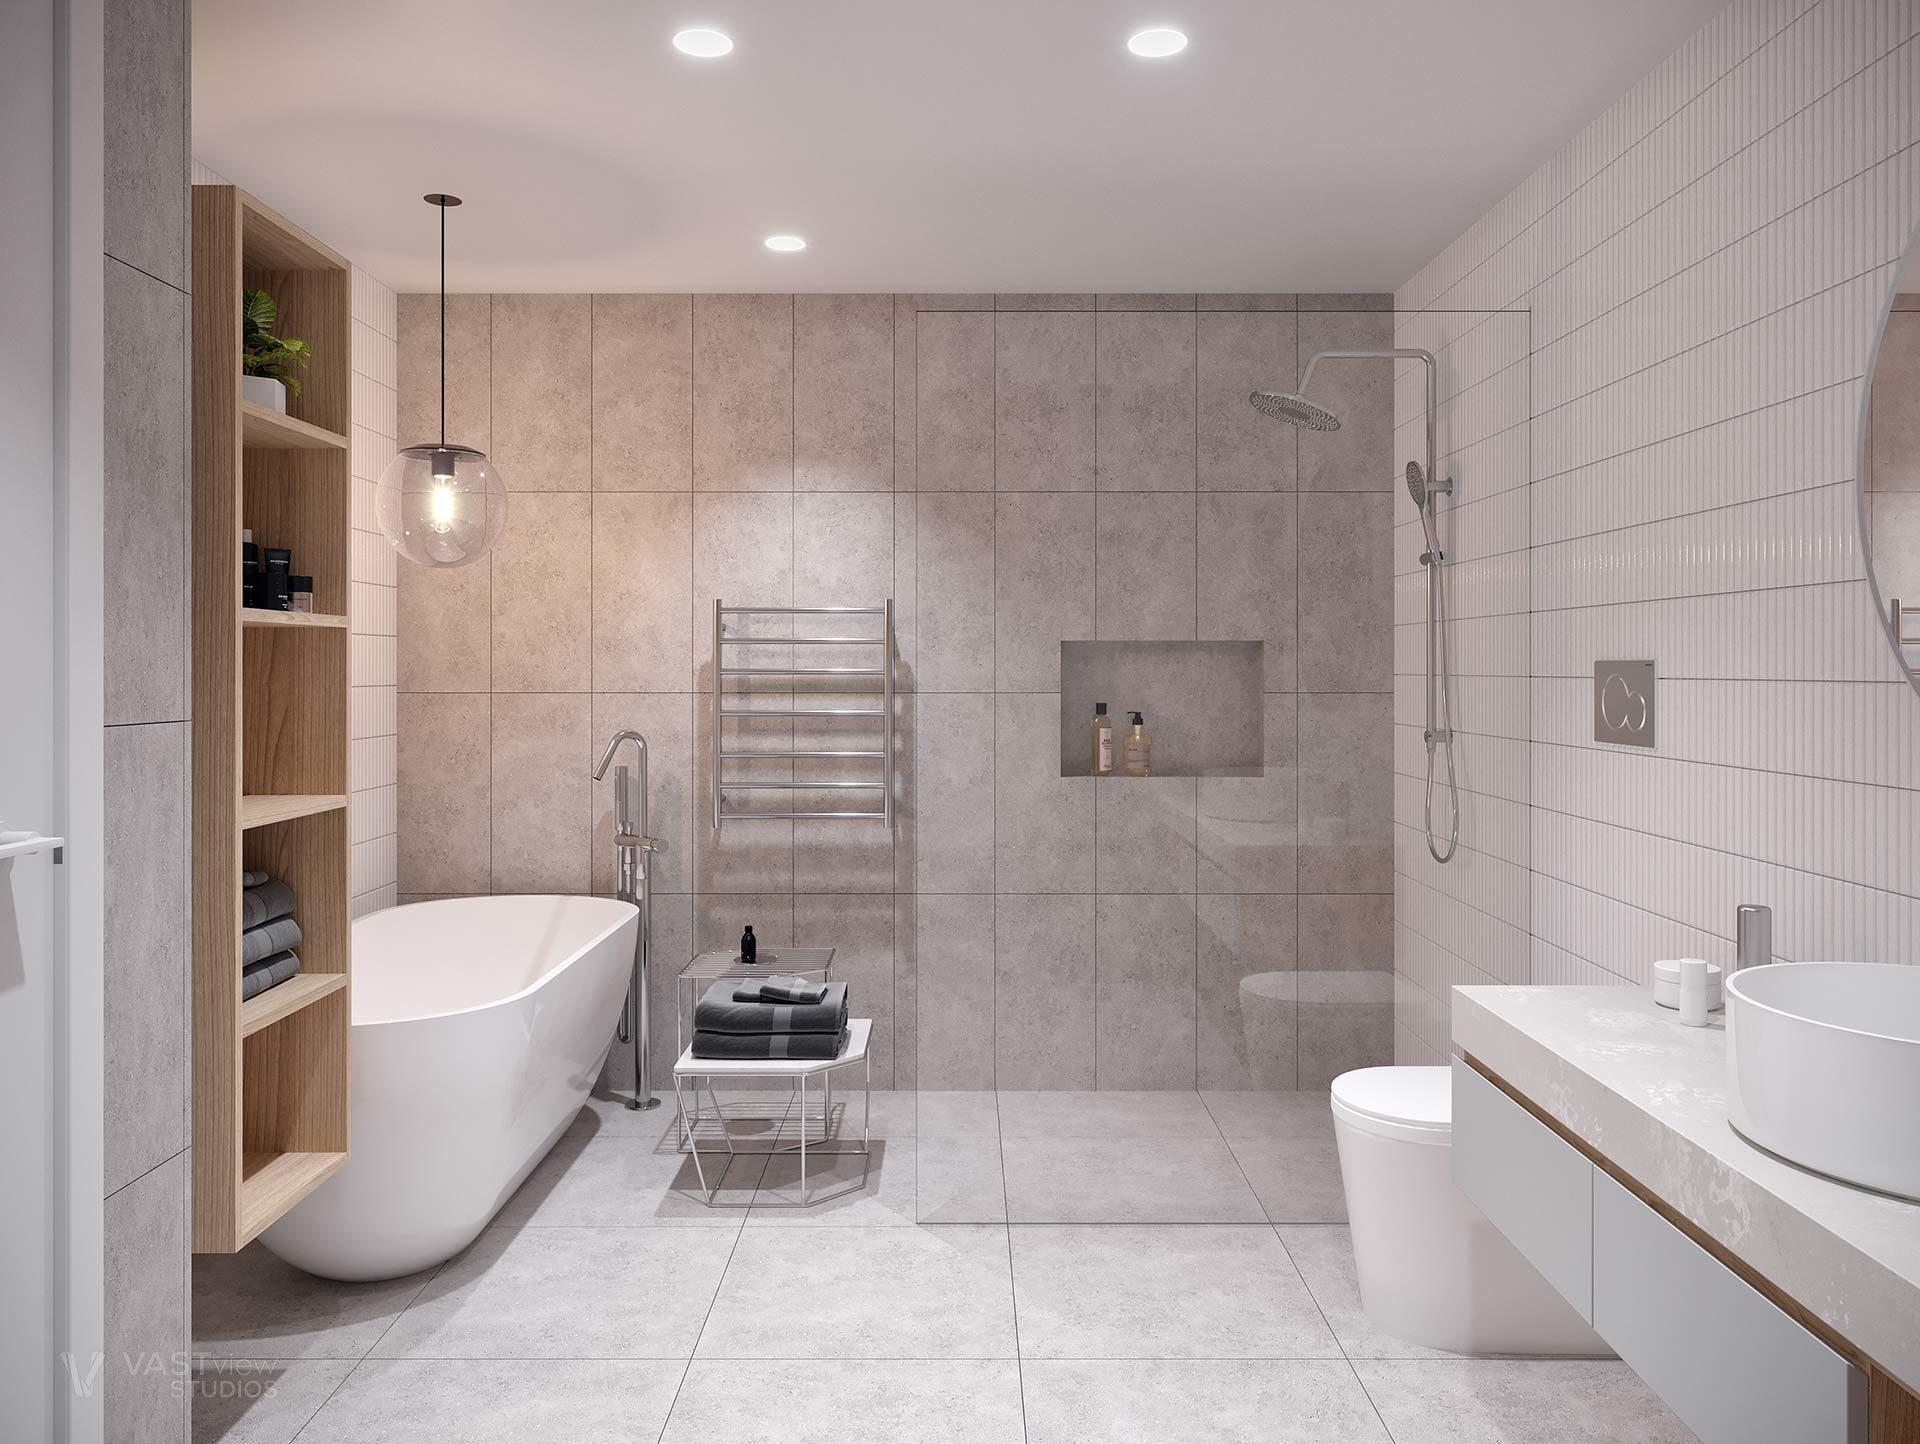 GreenridgeAve_BathroomUnit4_FinalRender_v1.0